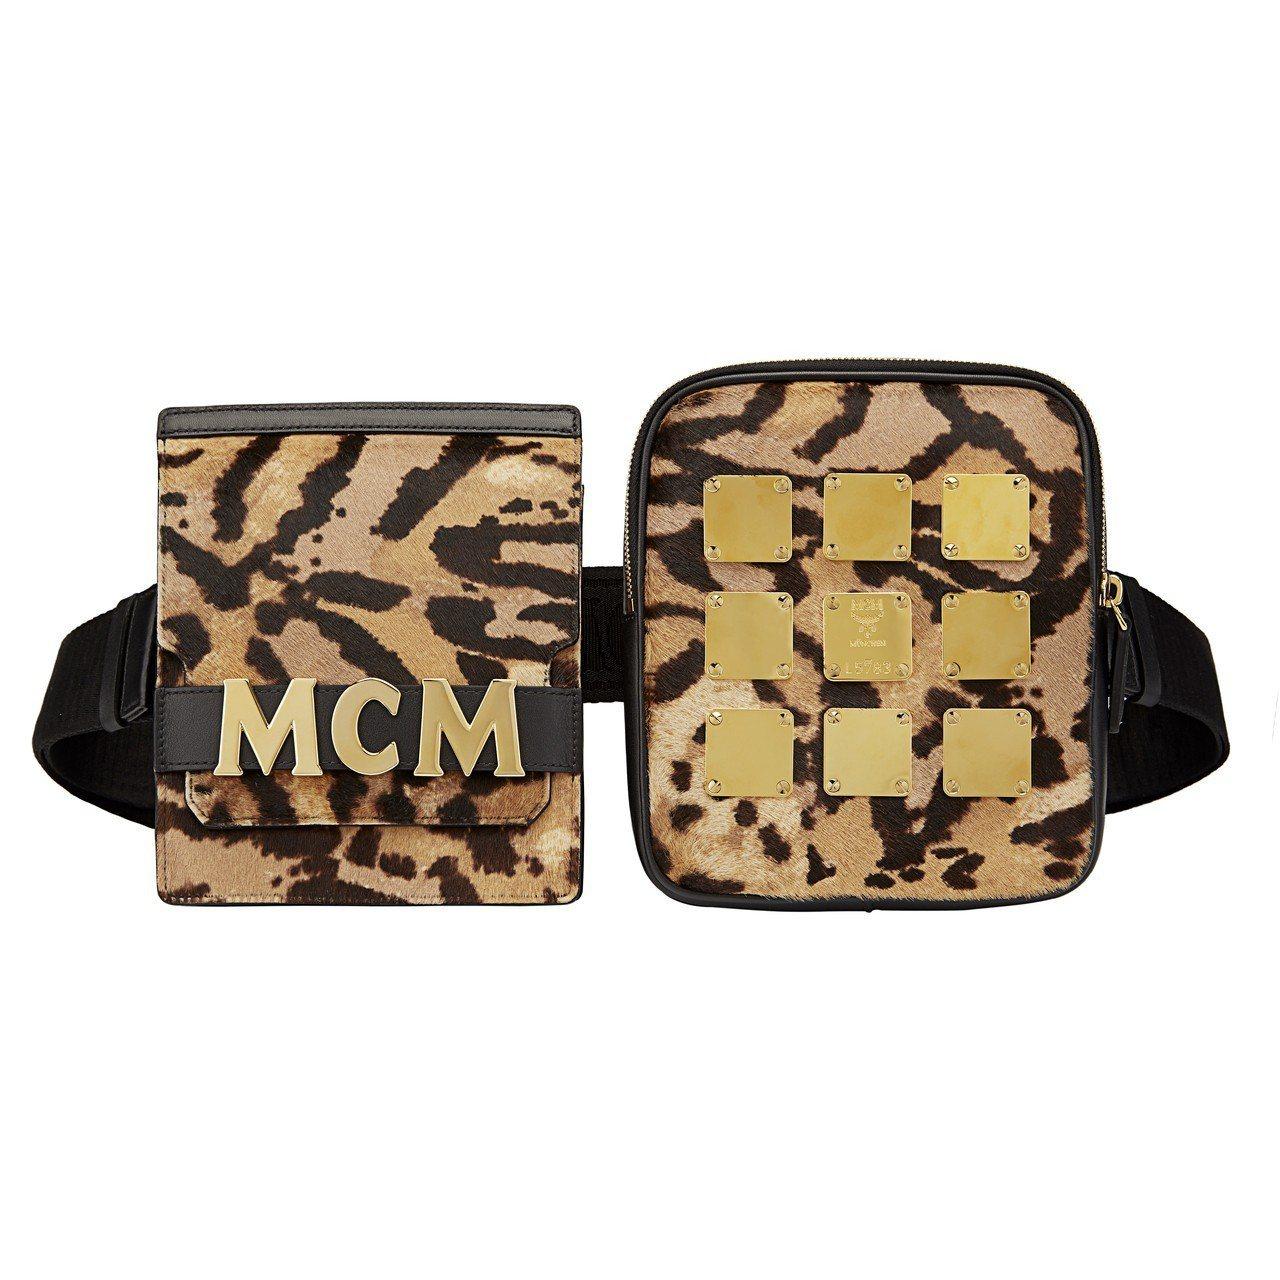 Stark Brass Plate豹紋腰包,31,500元。圖/MCM提供